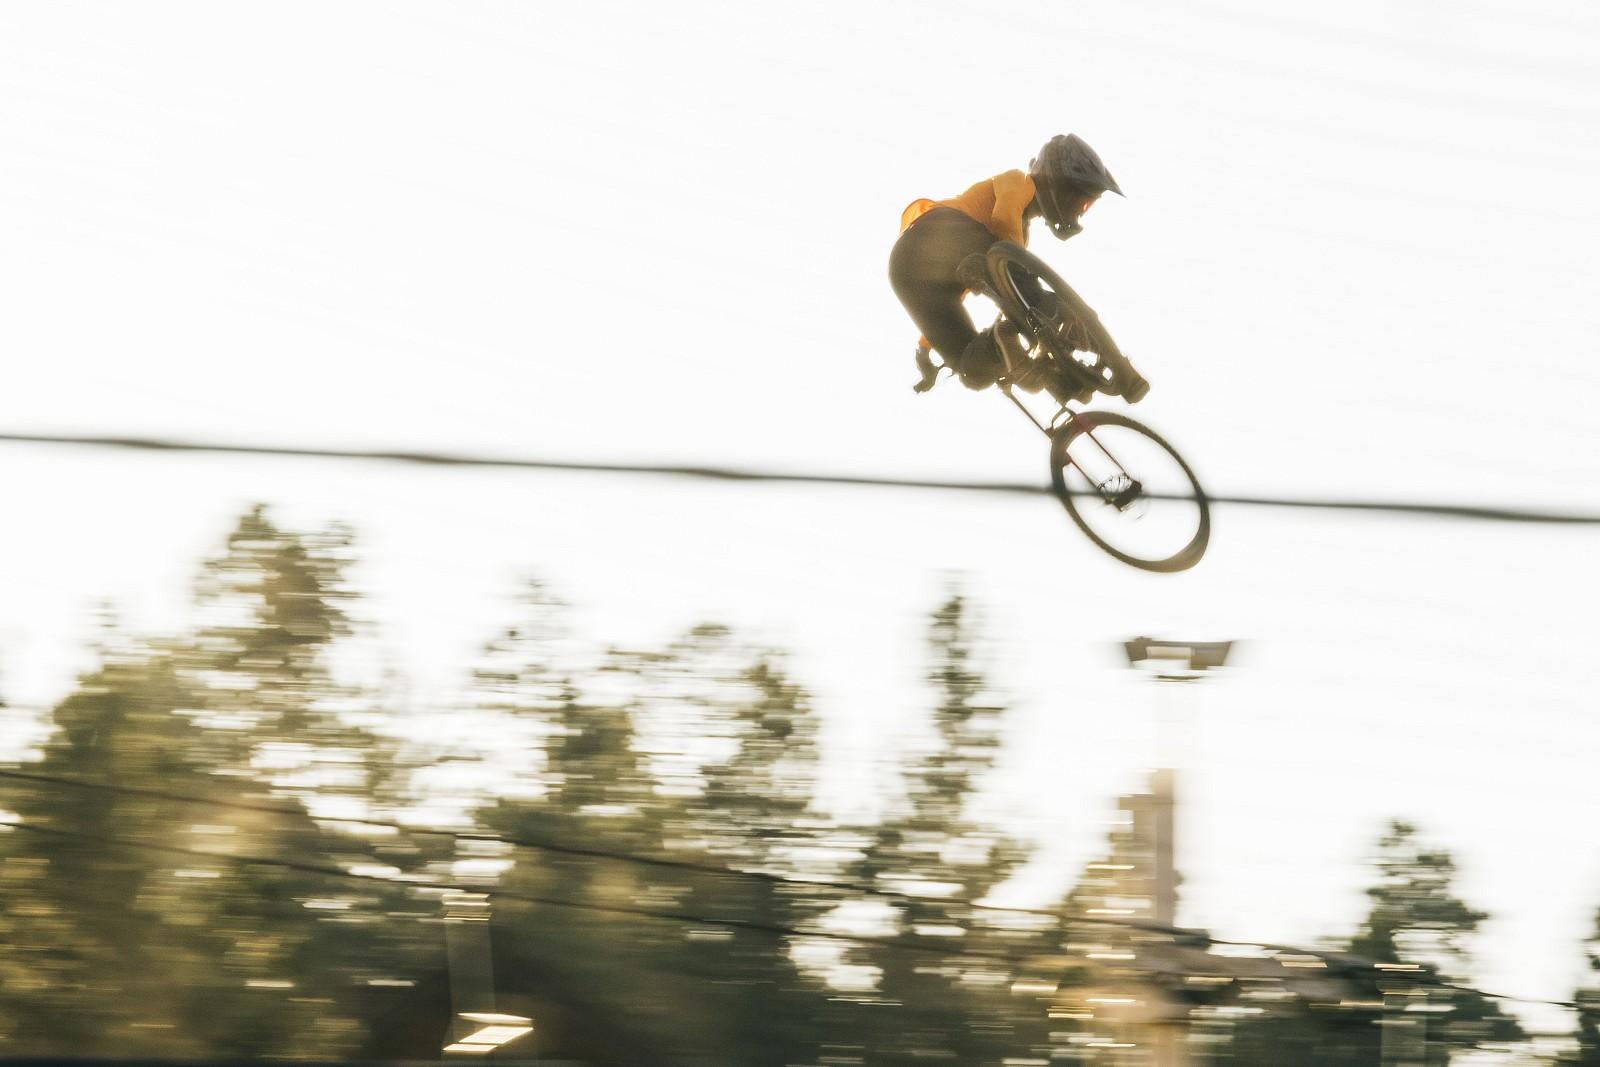 2019USOpenMTBWhip yellow-31 - ALeedomPhotography - Mountain Biking Pictures - Vital MTB